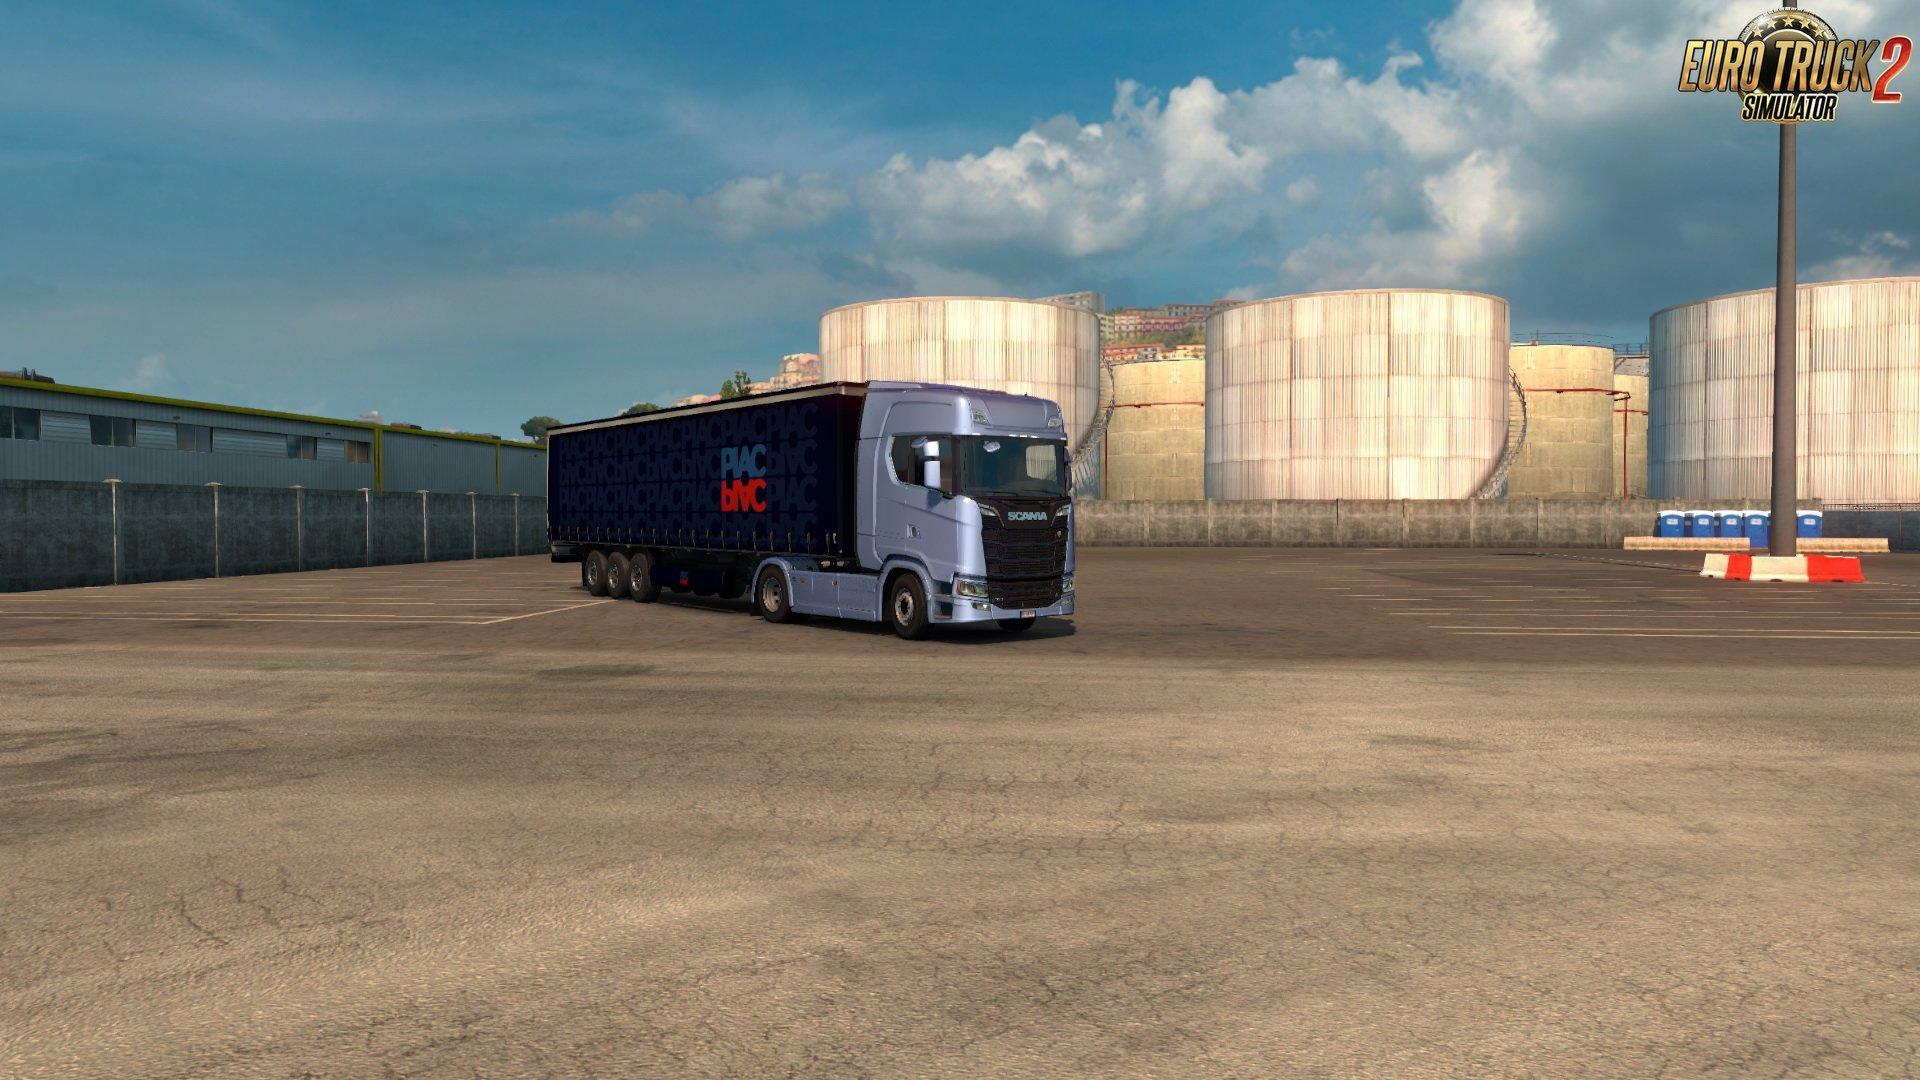 IMPROVED GRAPHICS MOD V2 1 3 (1 30 X) ETS2 -Euro Truck Simulator 2 Mods